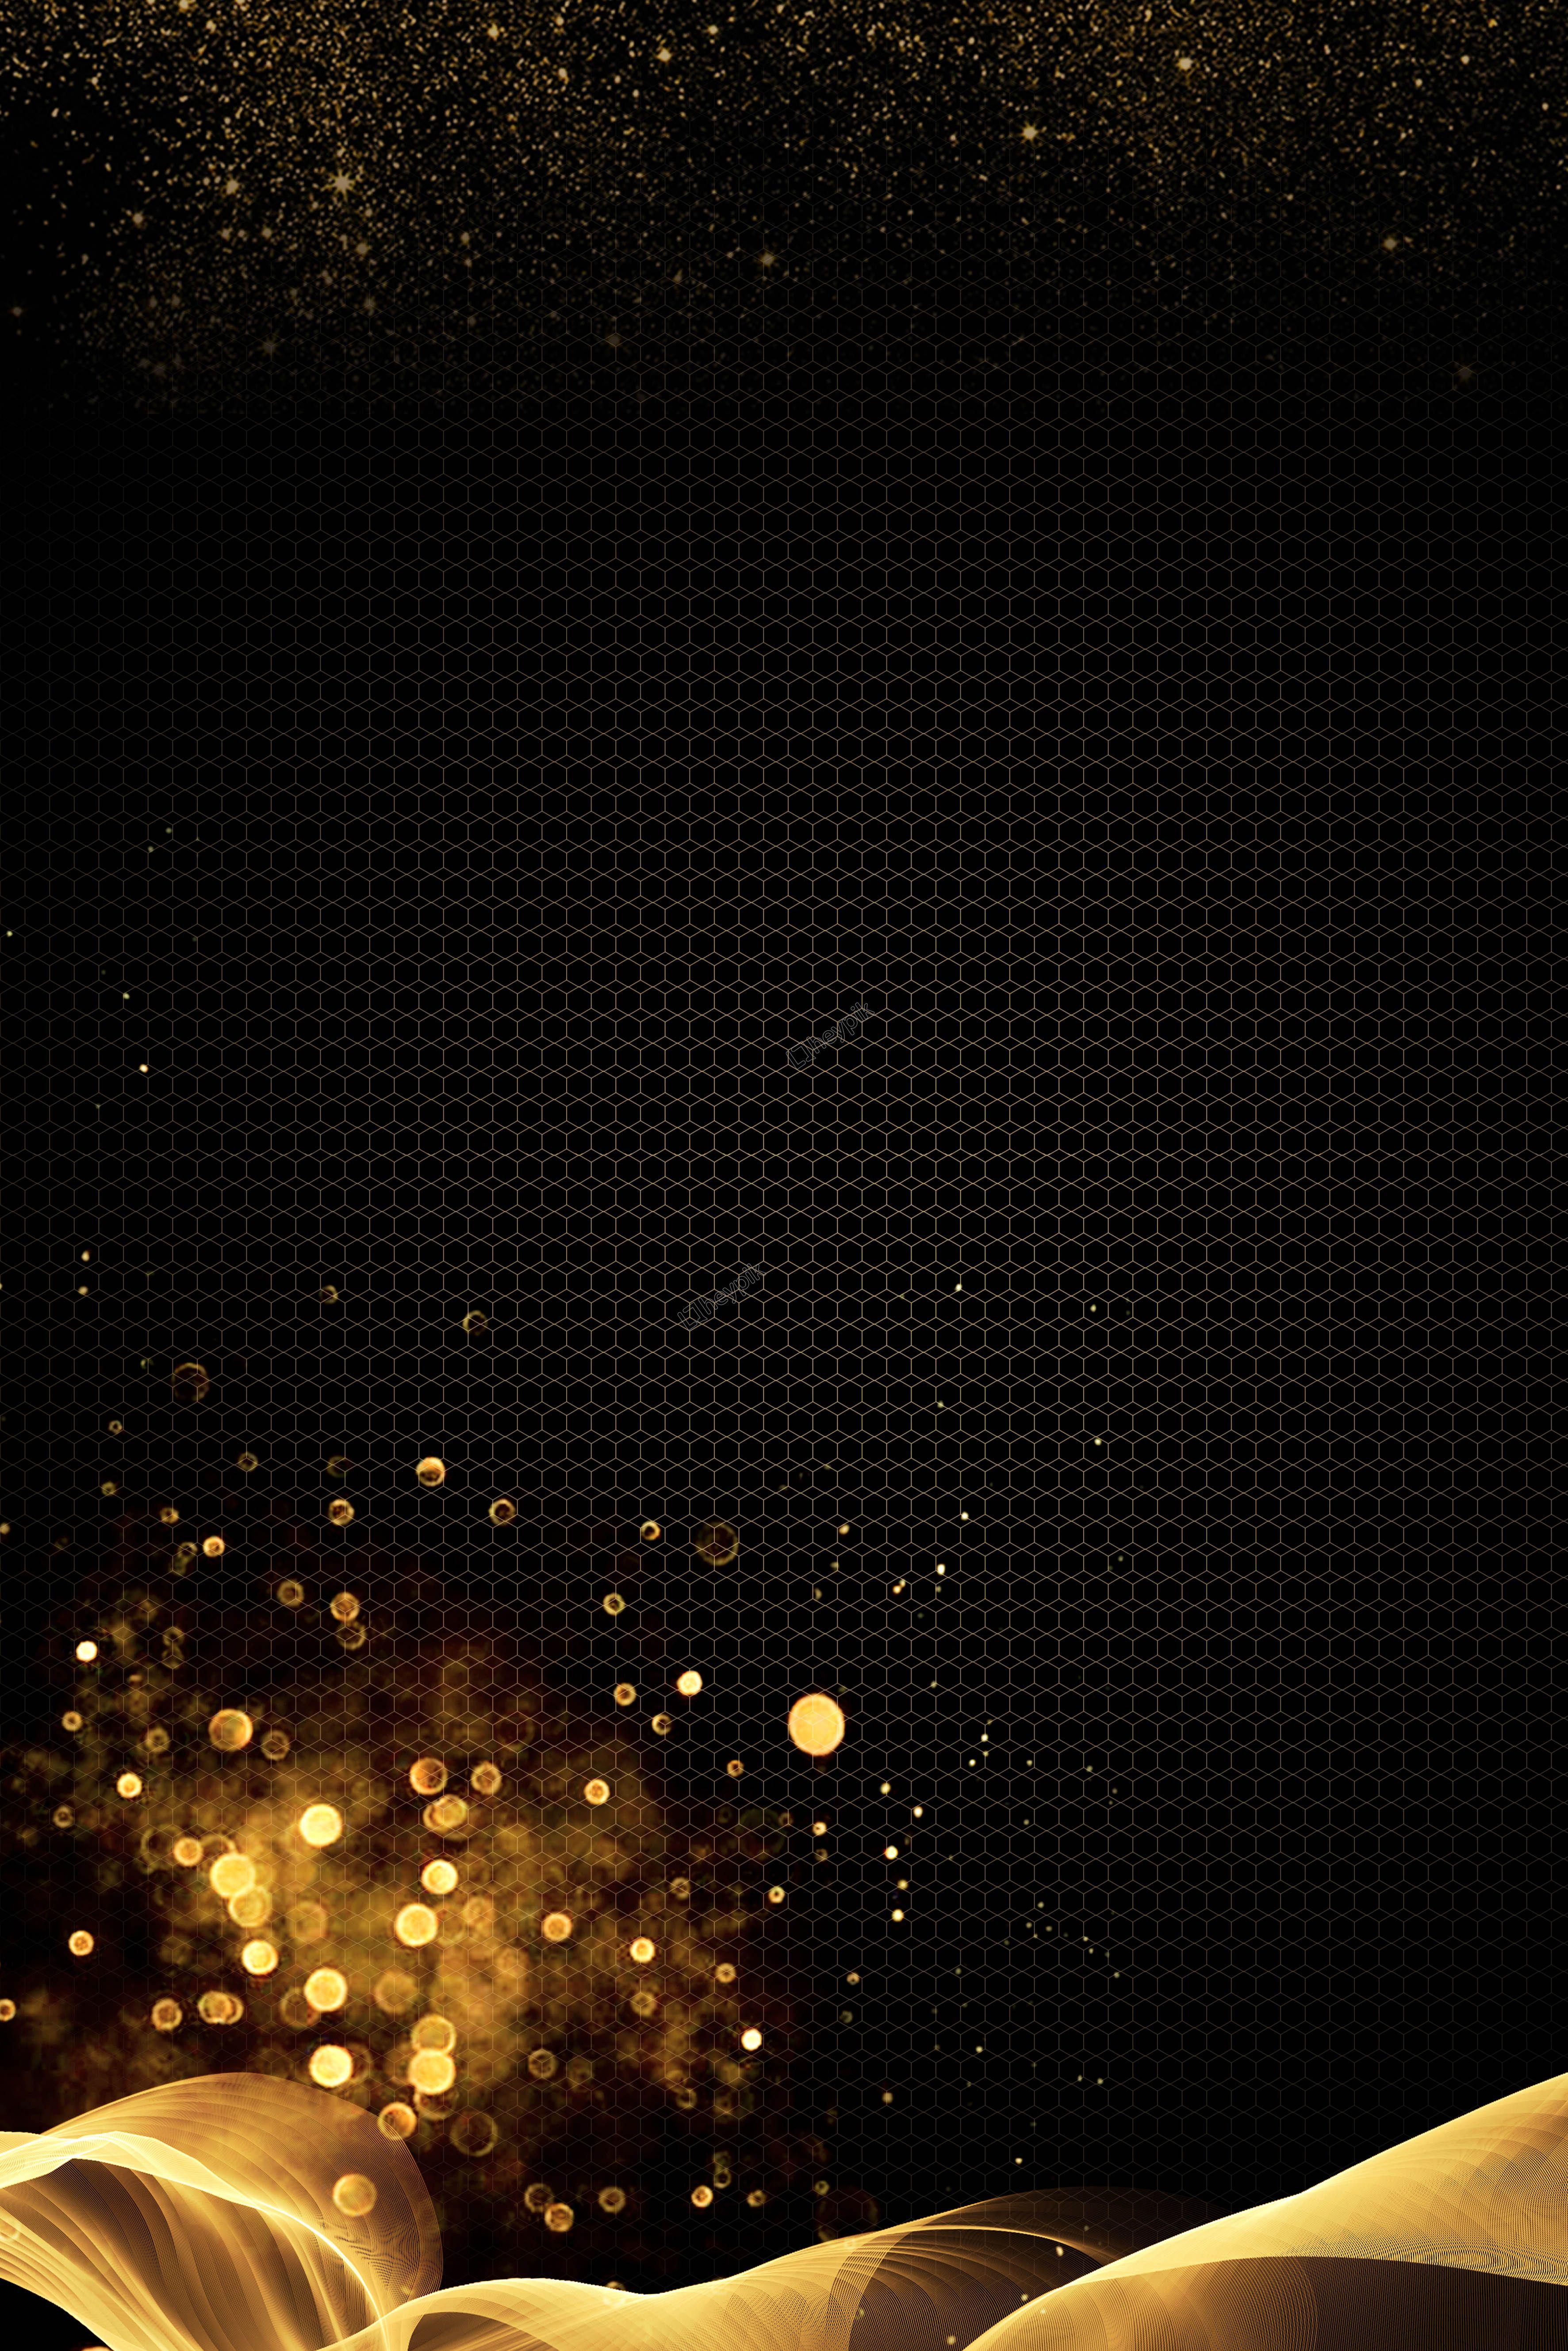 Sfondo Oro Nero Sintetico Creativo Blurred Background Photography Love Background Images Black Background Design